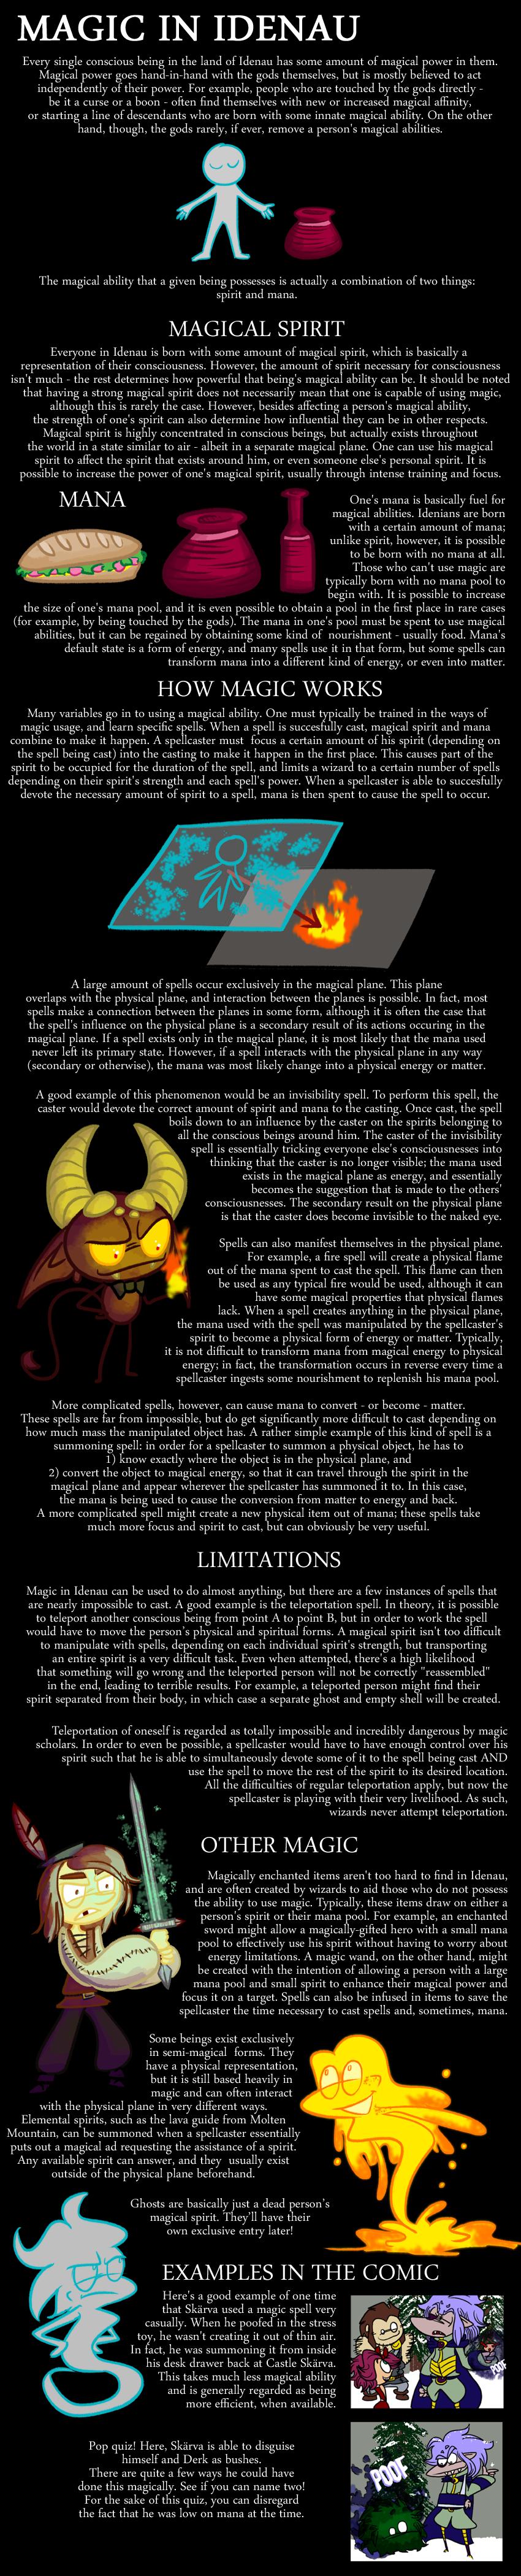 Encyclopedia of Idenau: Magic